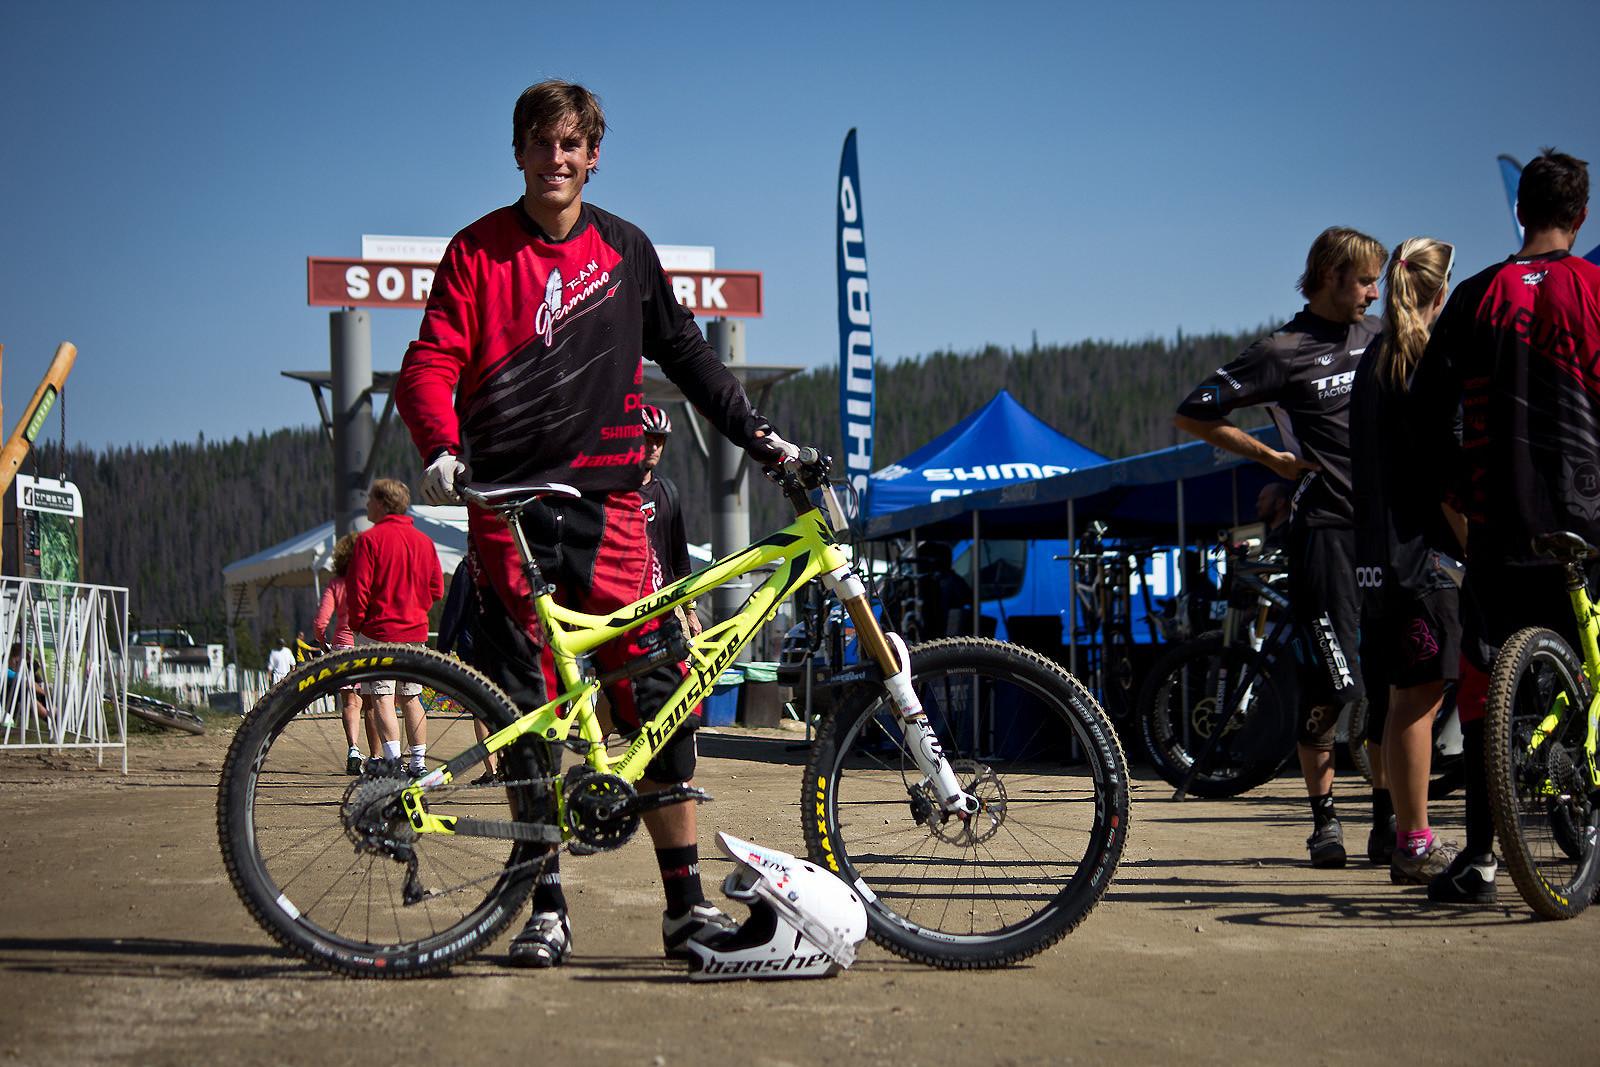 Winning Bike: Brian Buell's Banshee Rune - Winning Bike: Brian Buell's Banshee Rune - Mountain Biking Pictures - Vital MTB